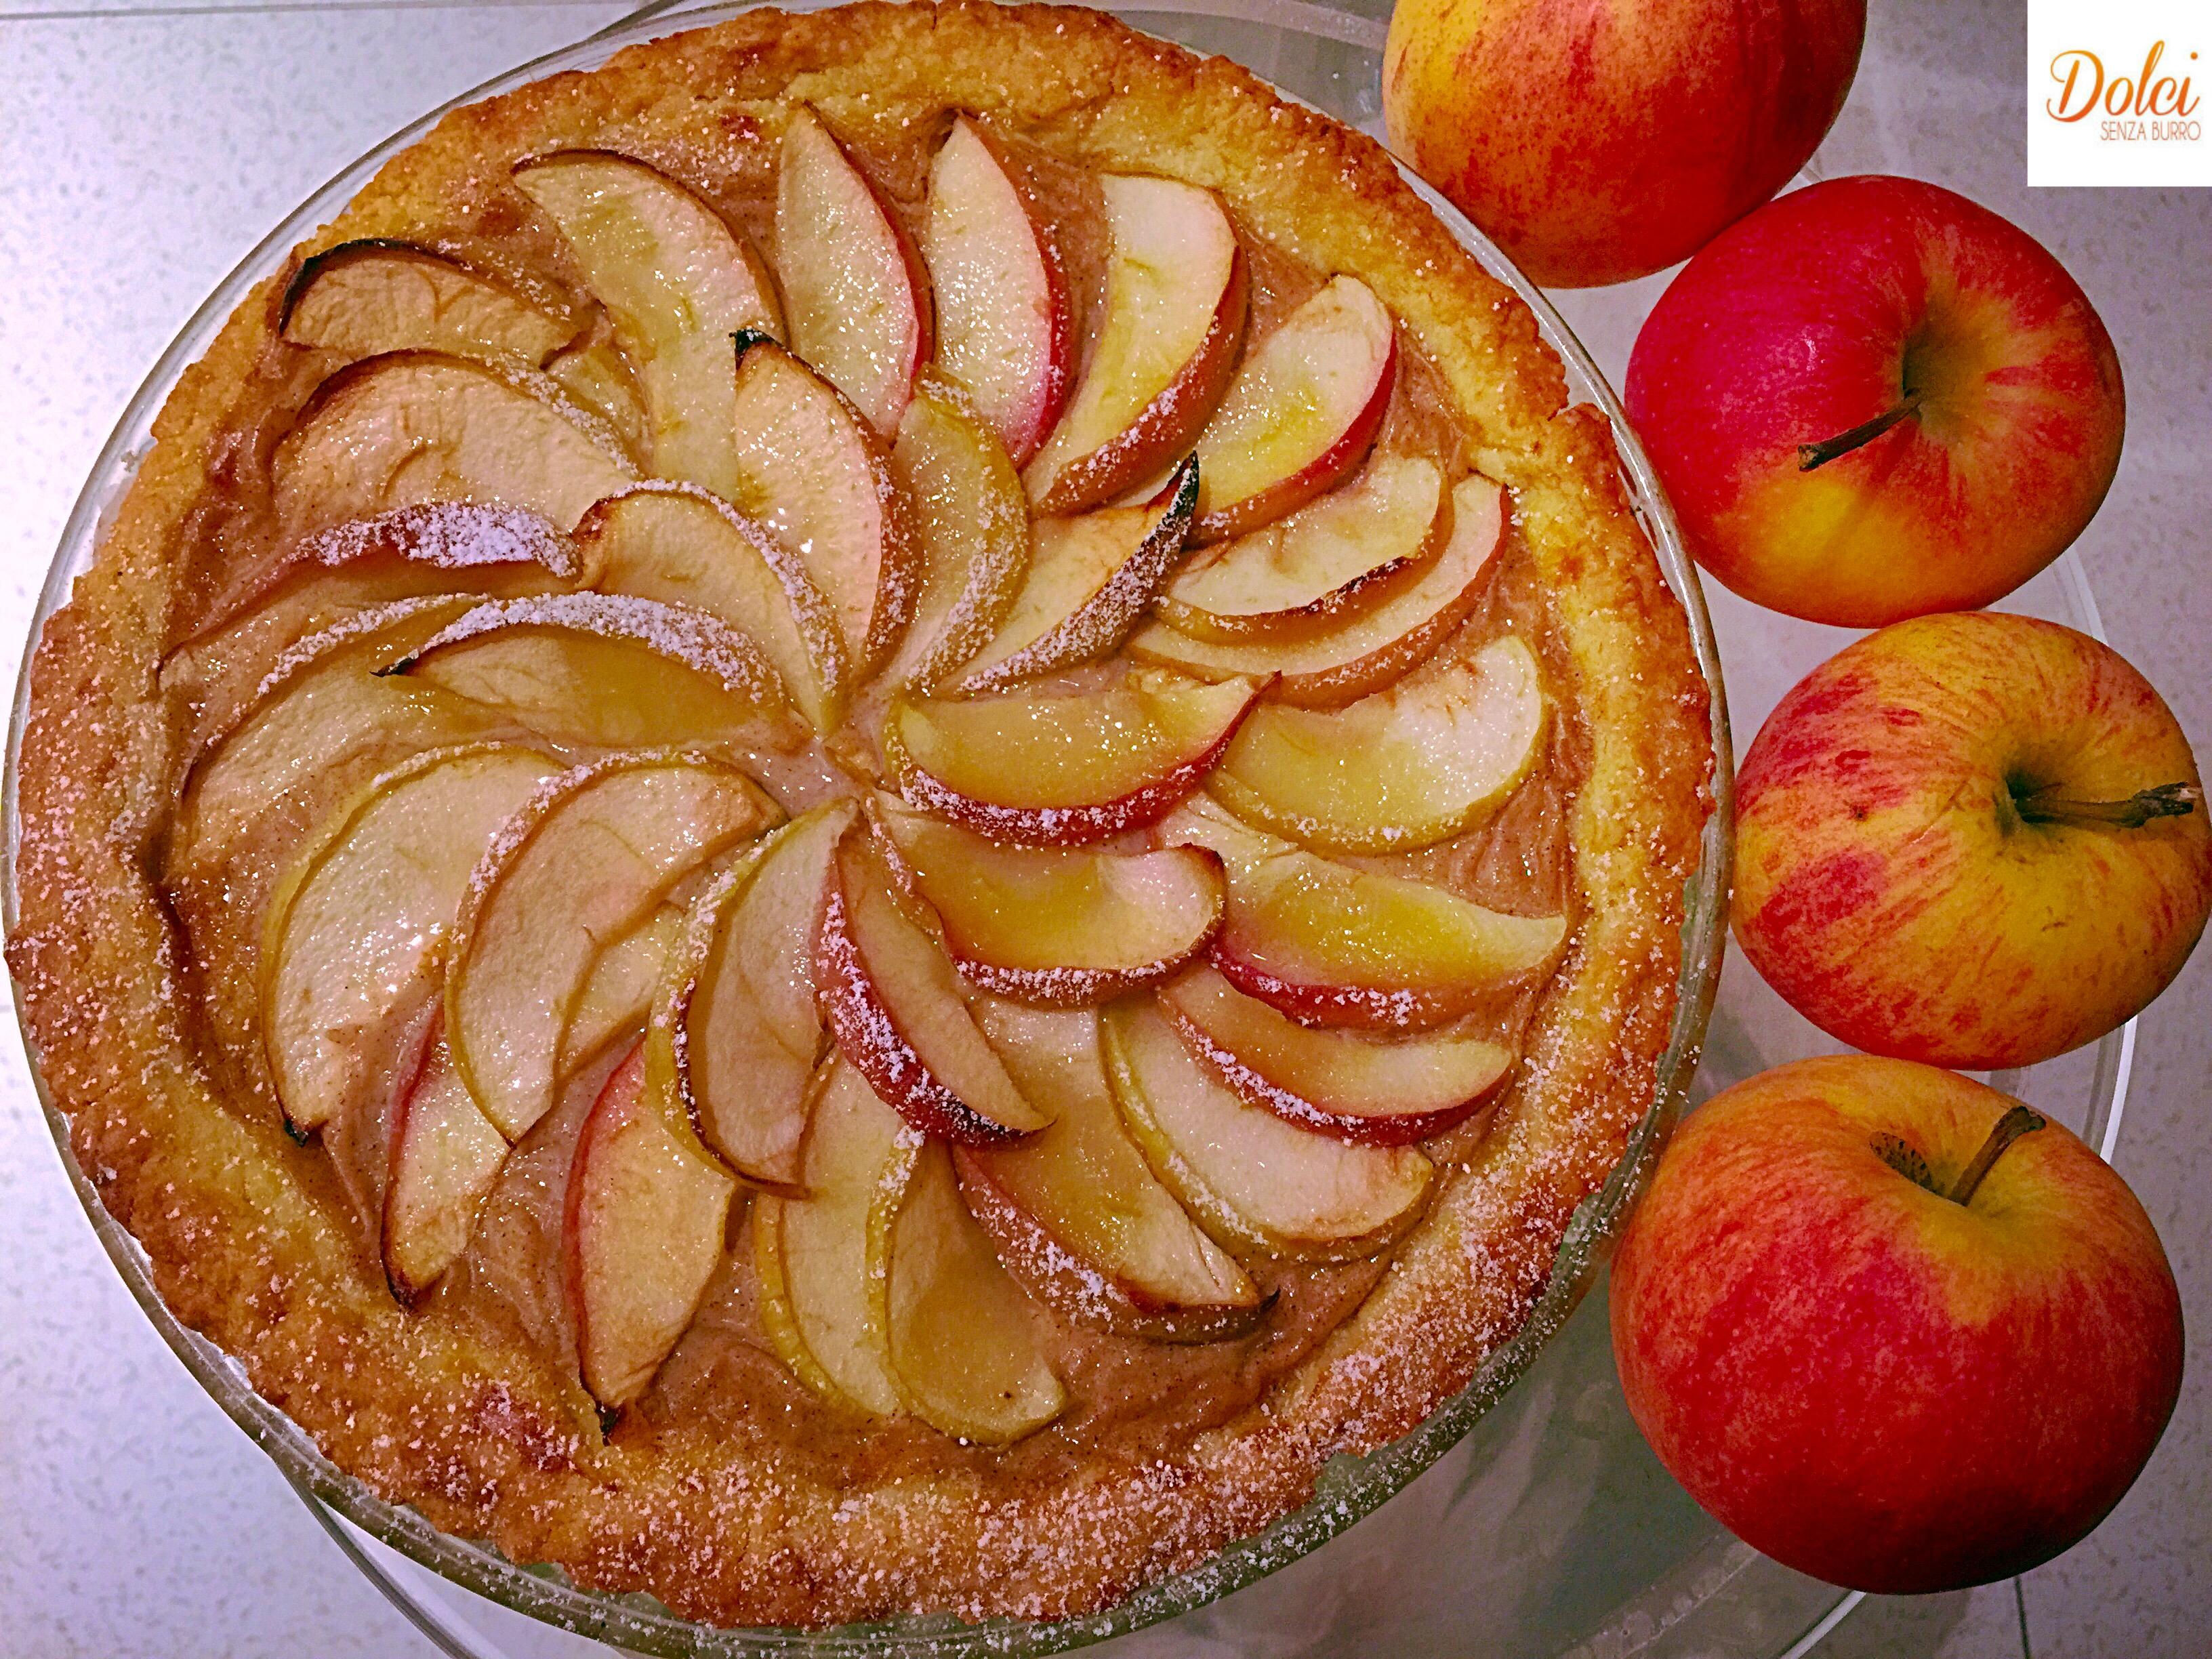 Crostata di mele senza burro dolci senza burro - Immagini stampabili di mele ...